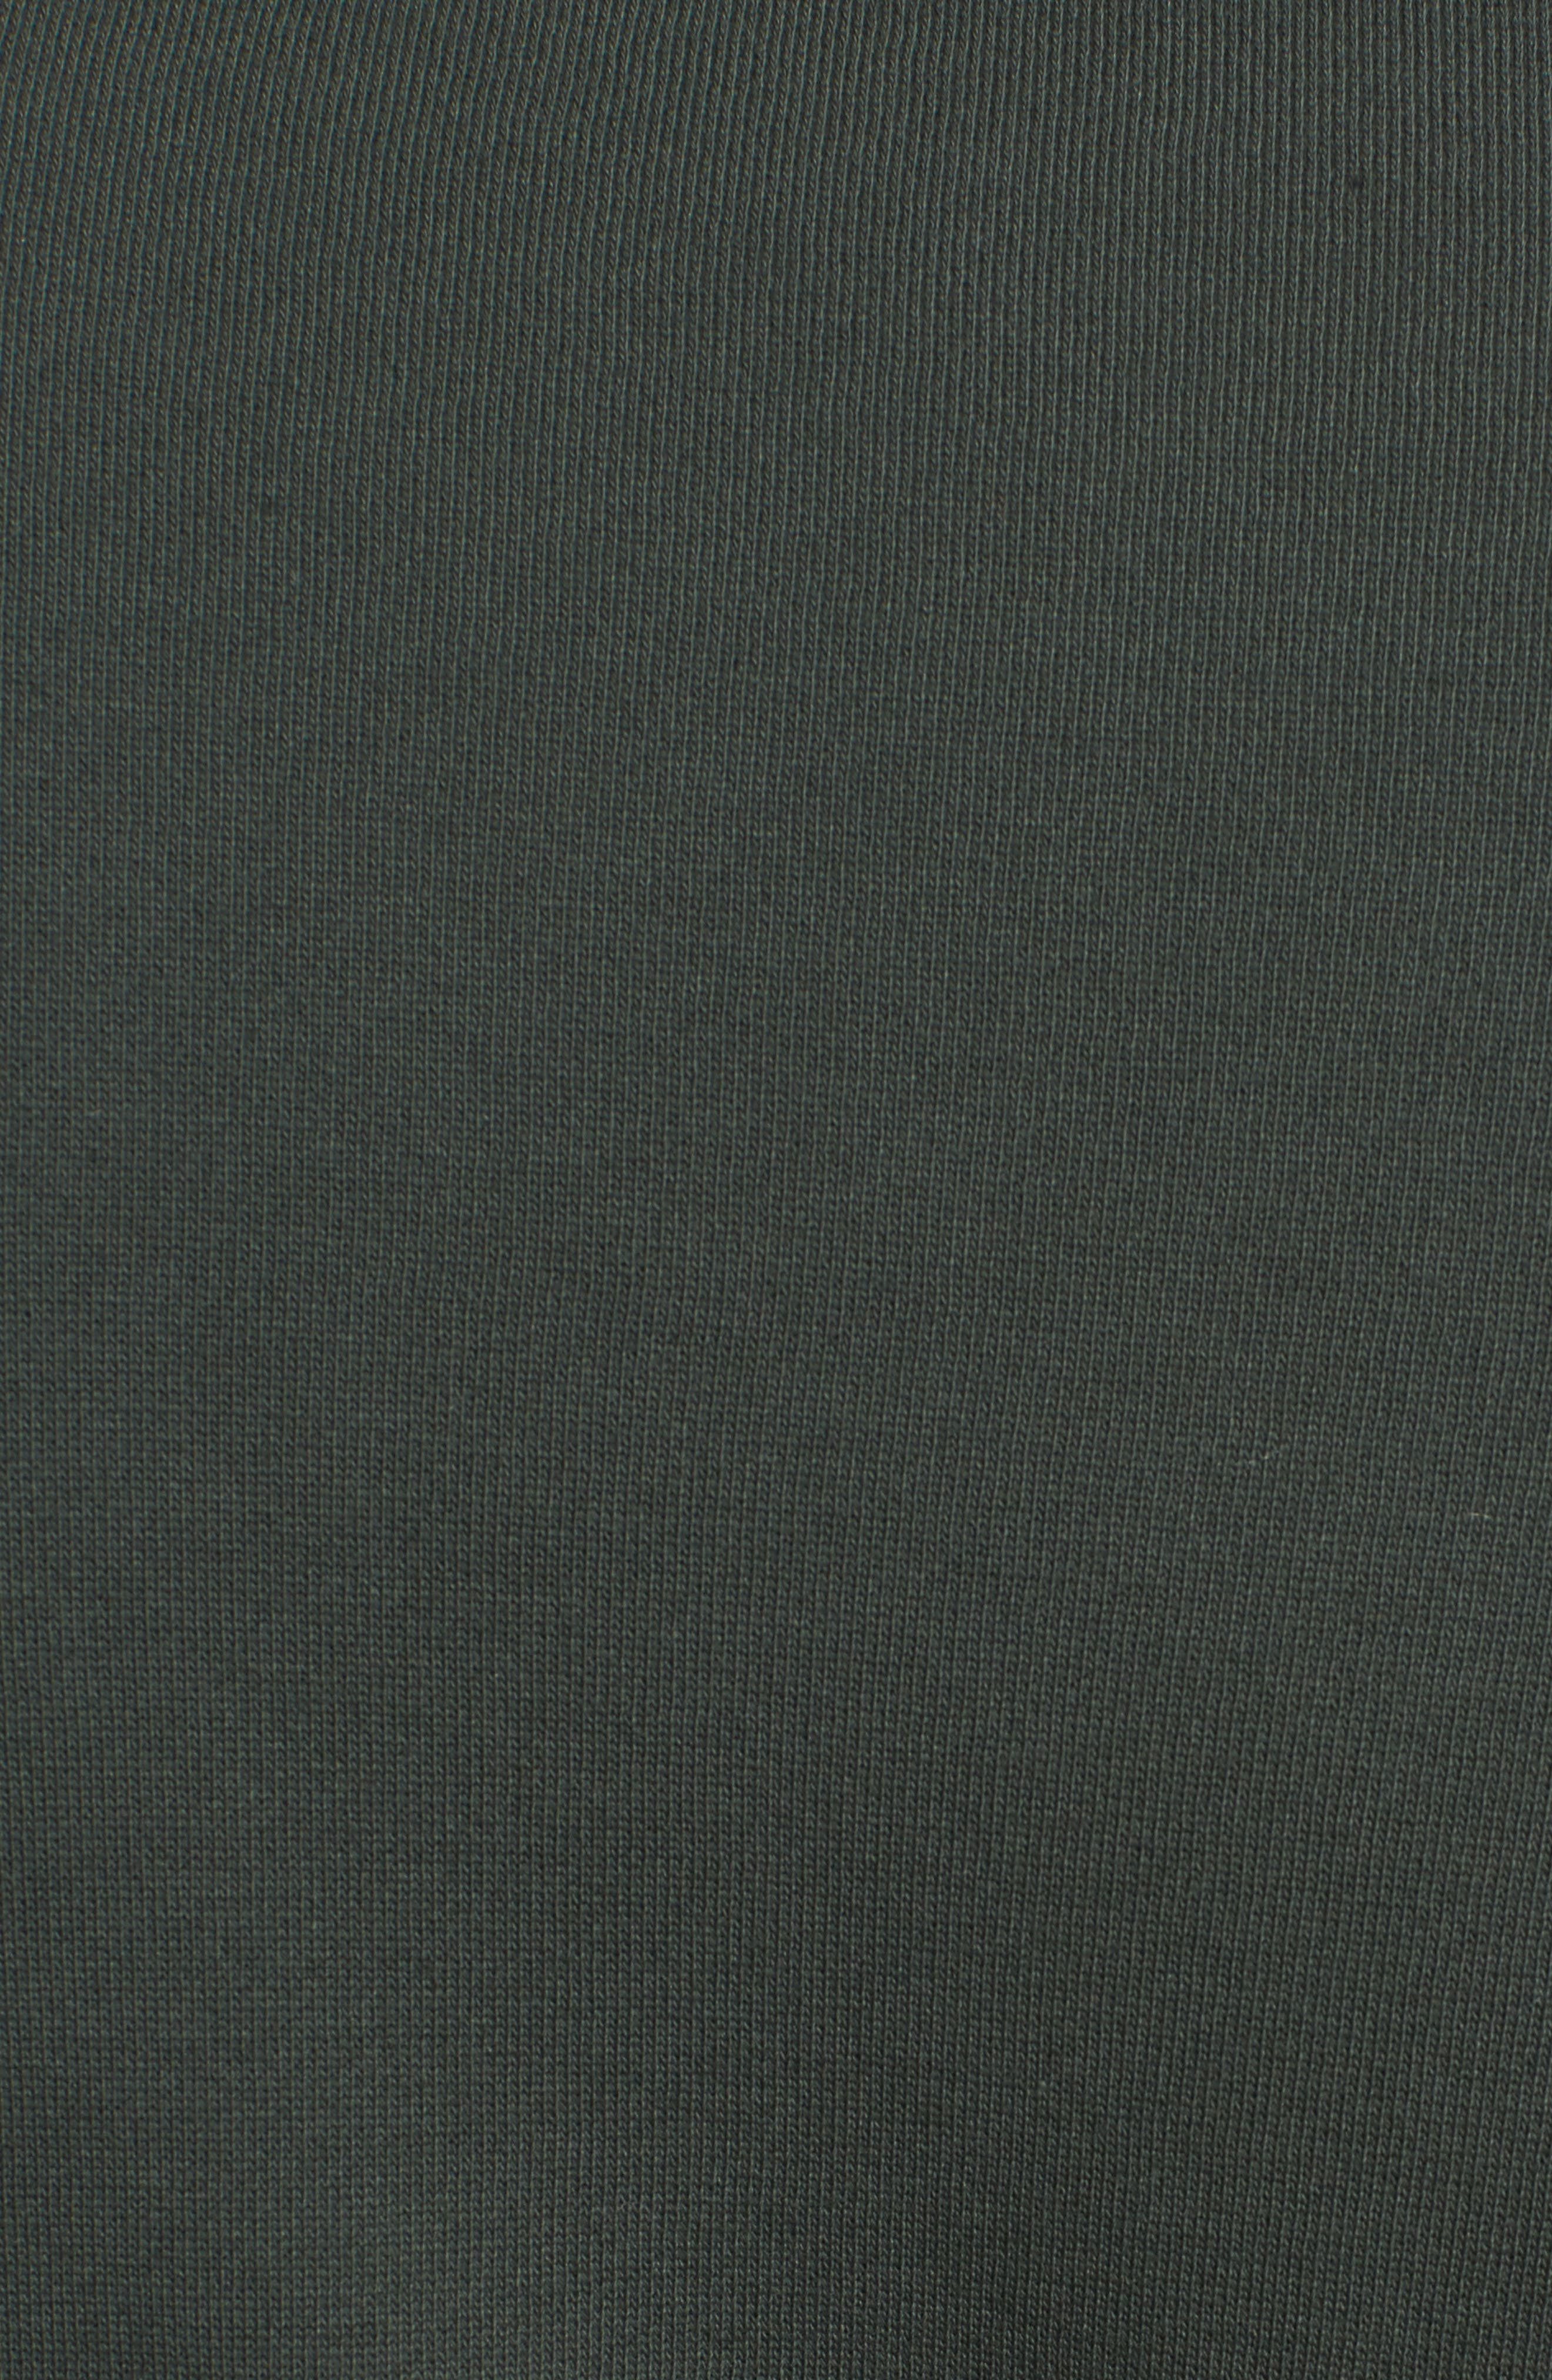 Adrian Sweatshirt,                             Alternate thumbnail 5, color,                             Green Mountain Peak